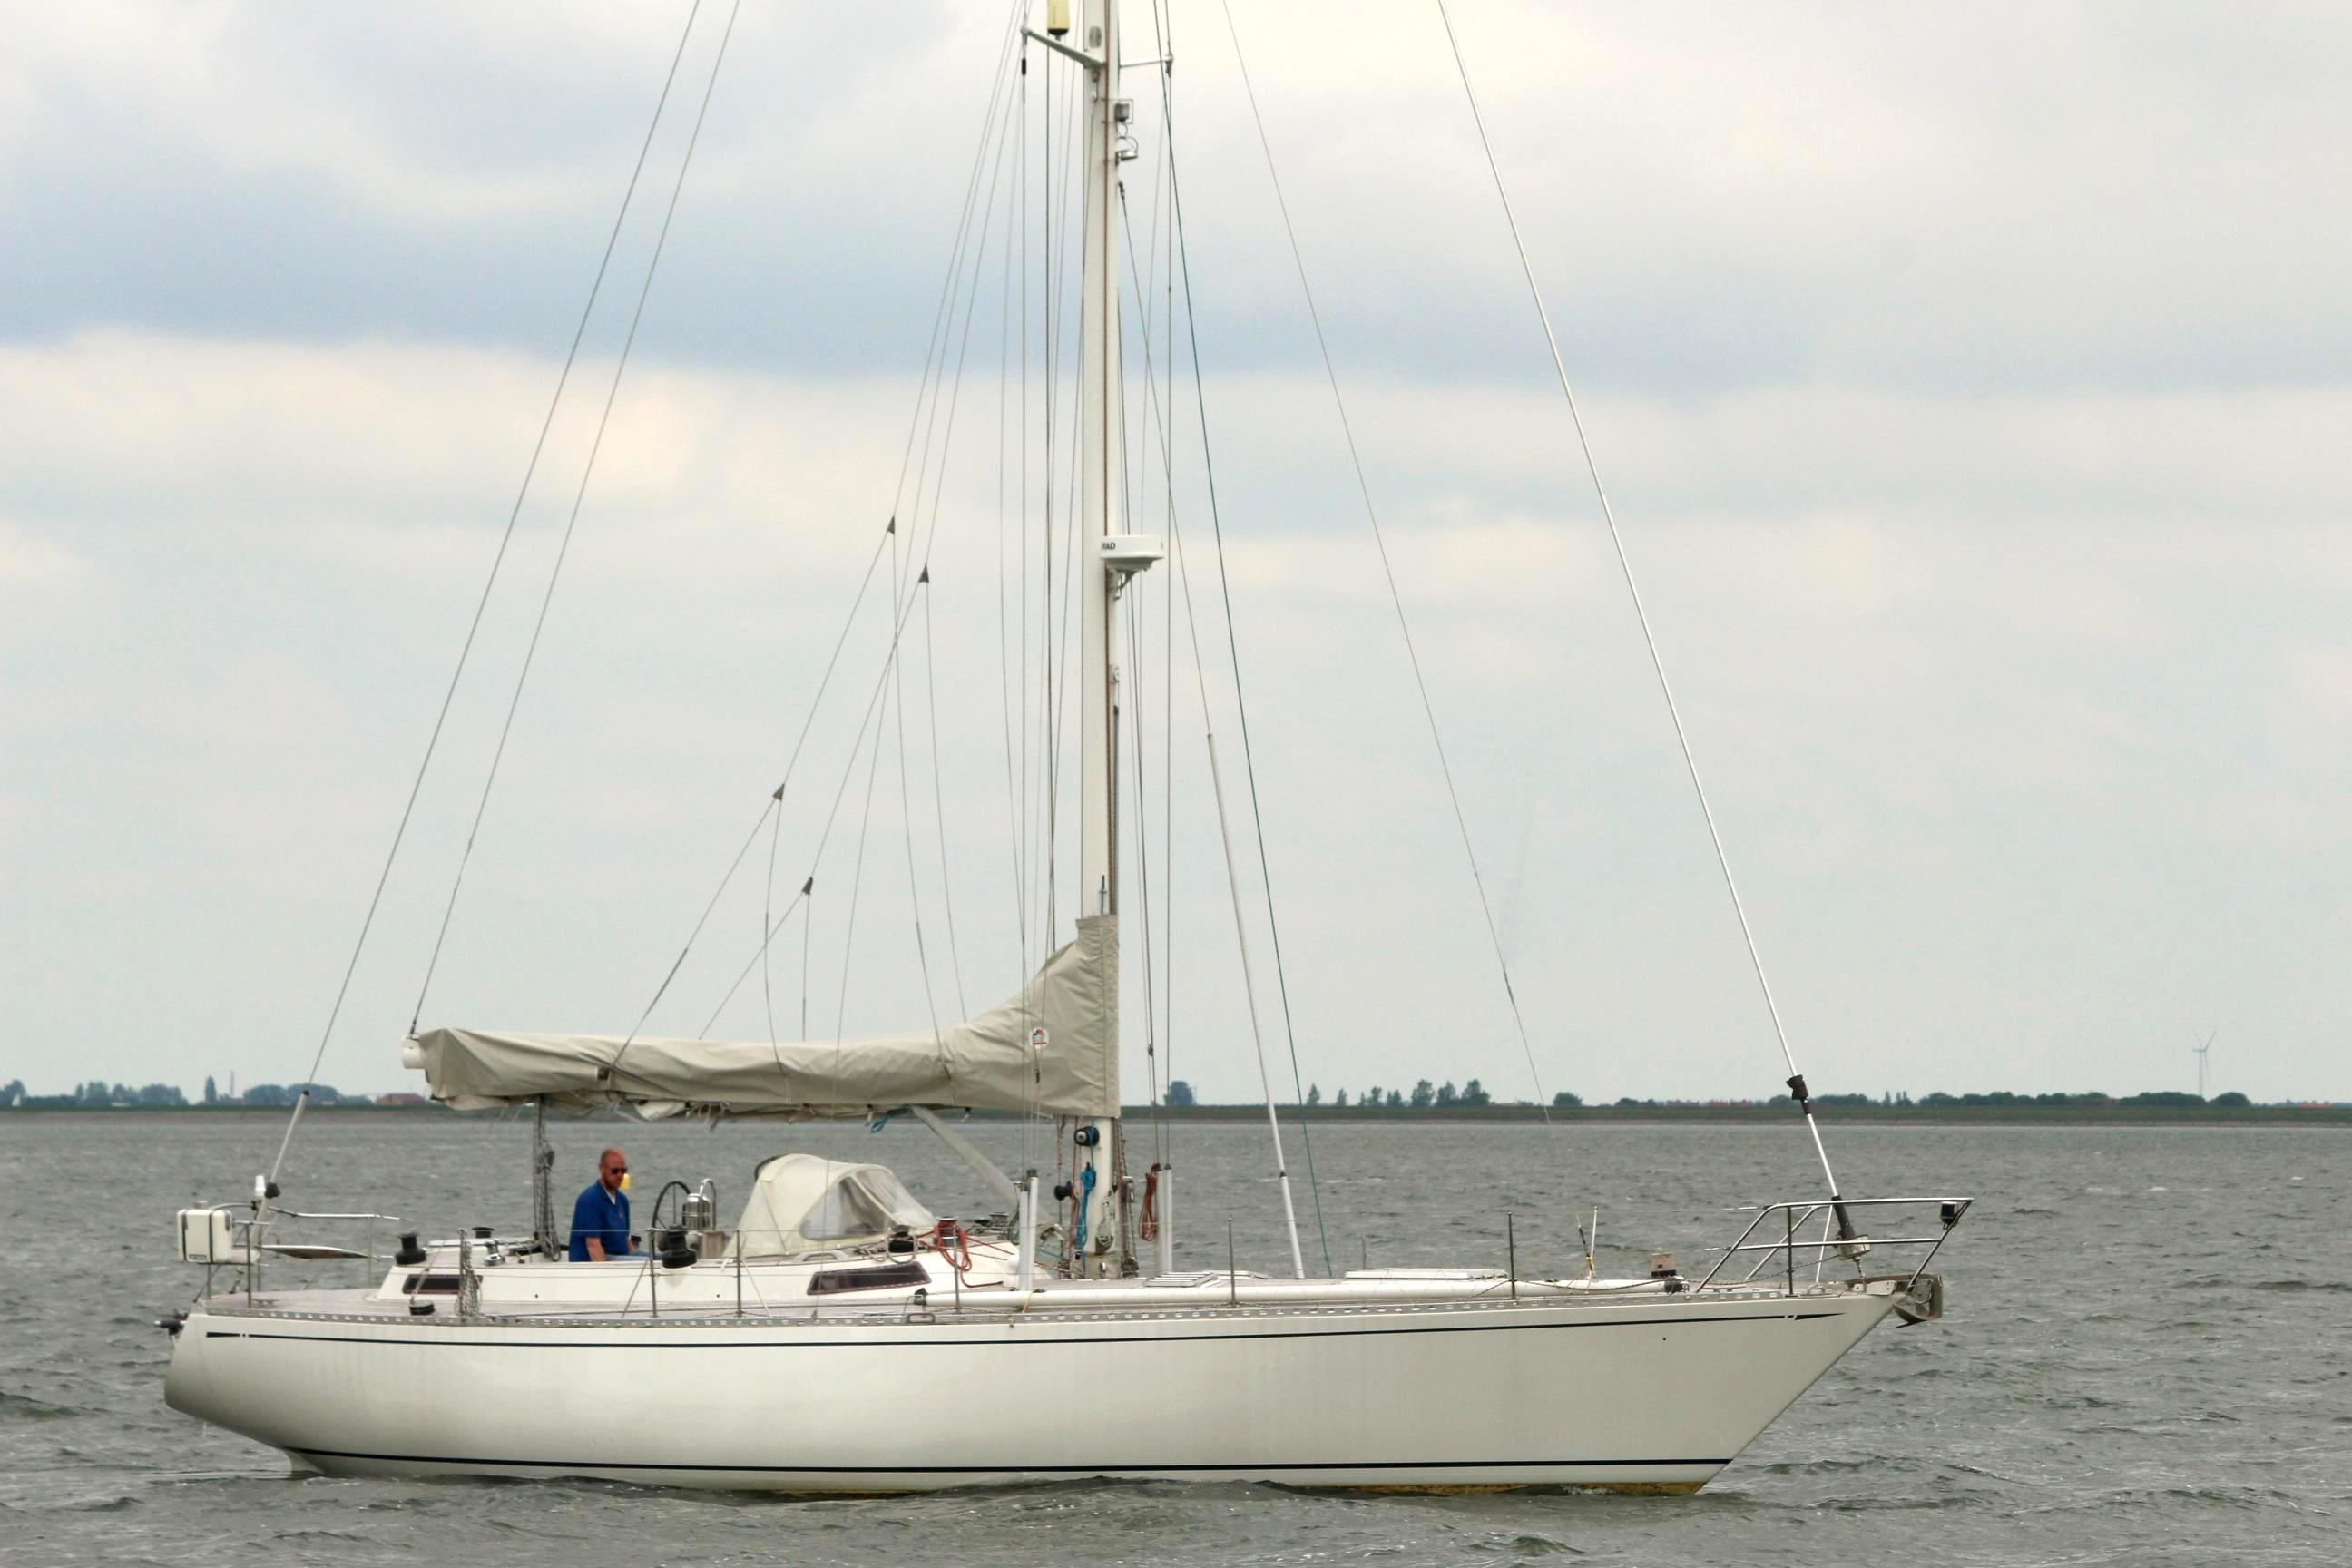 1979 Huisman 41 Sail Boat For Sale Wwwyachtworldcom